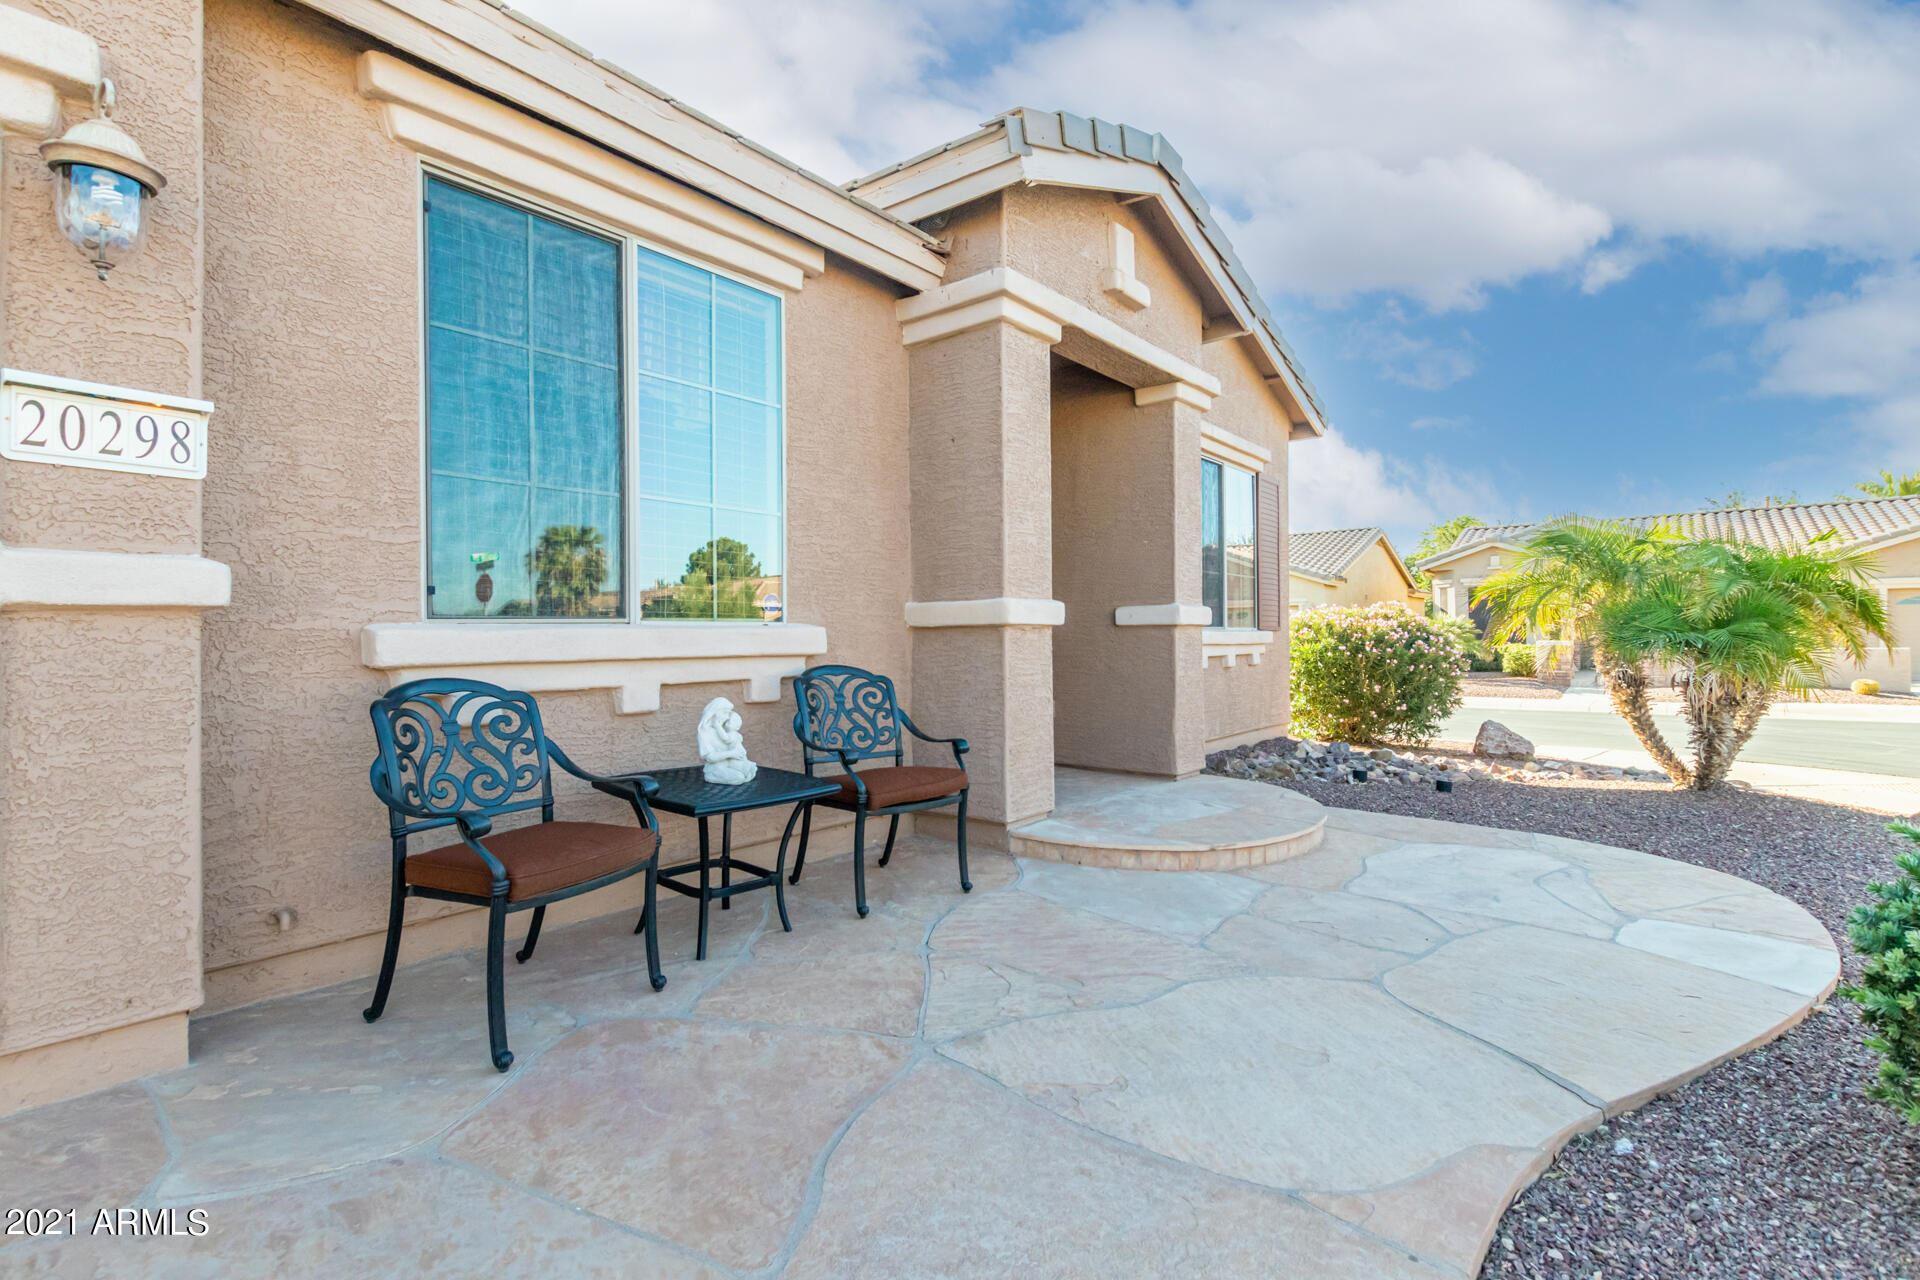 Photo of 20298 N OXBOW Lane, Maricopa, AZ 85138 (MLS # 6307154)